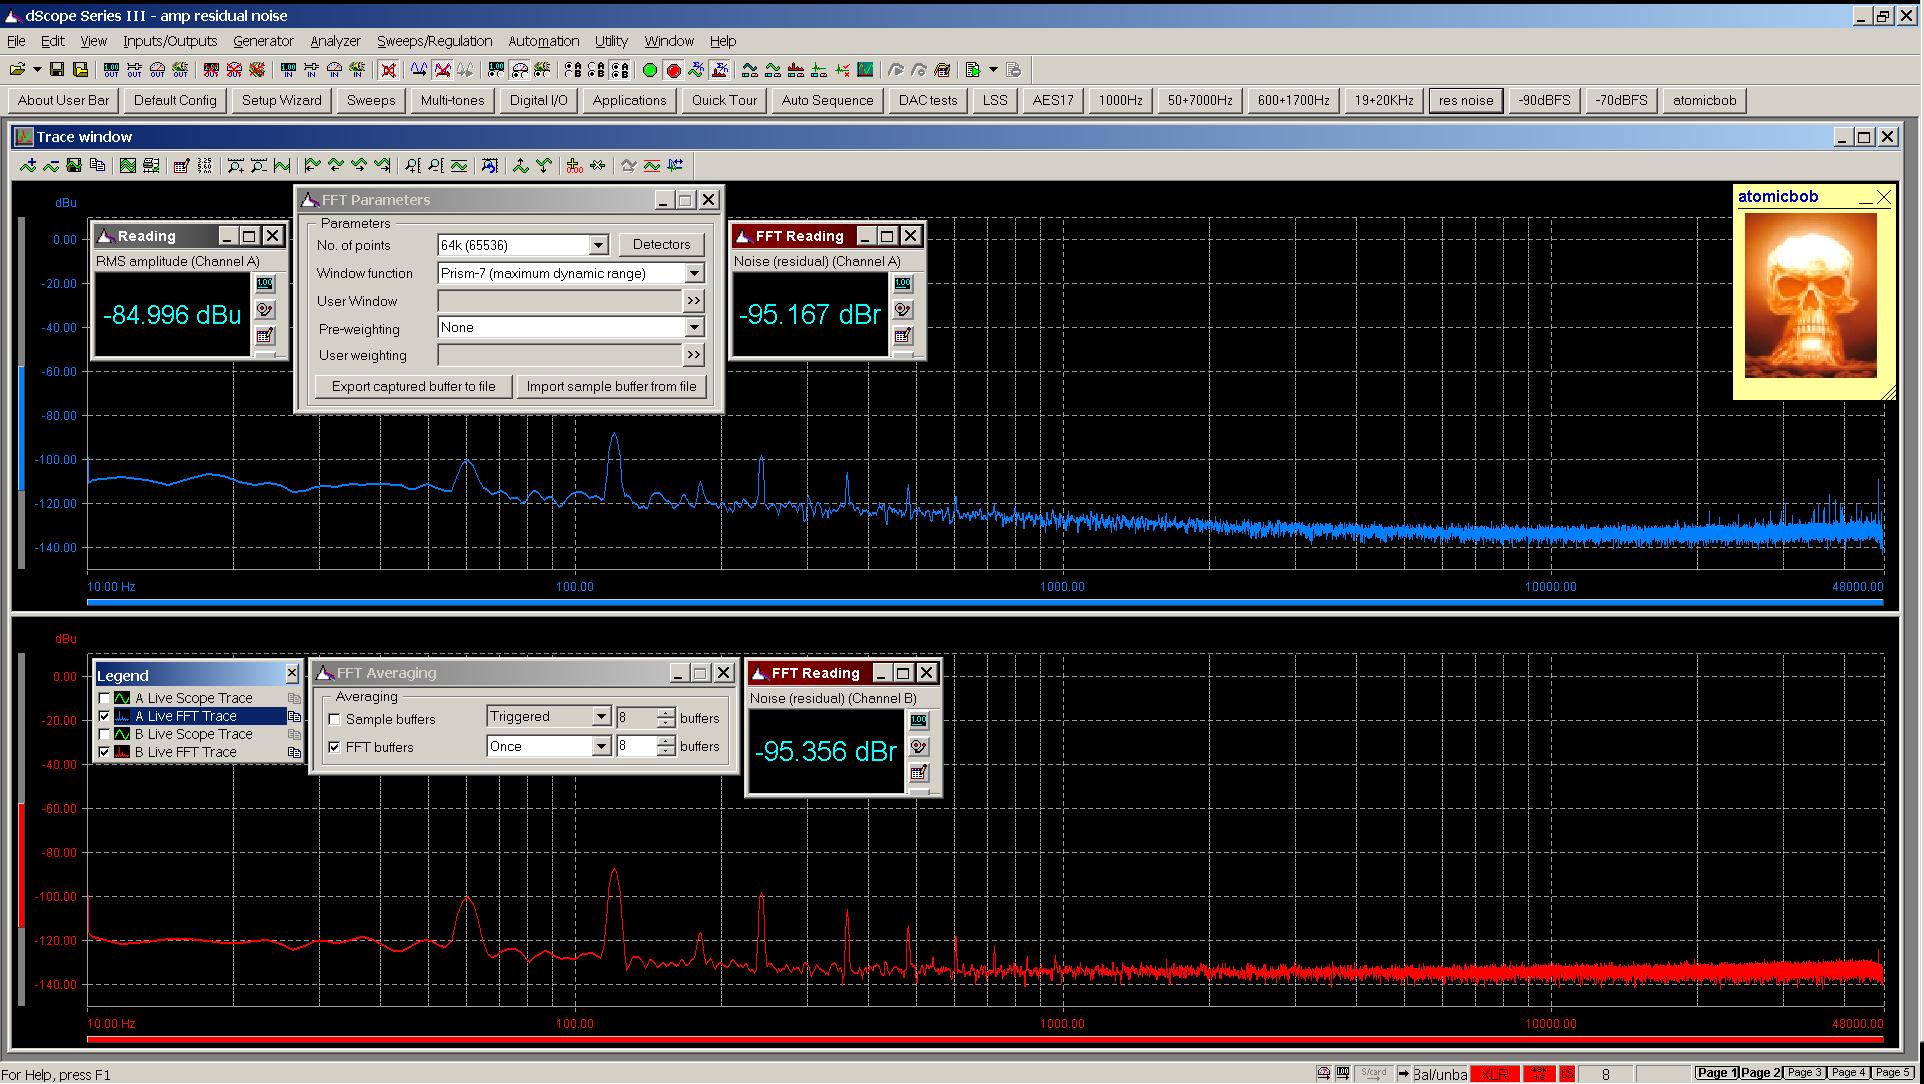 20181110 LiqPlat residual noise A=0dB 300R TRS.png